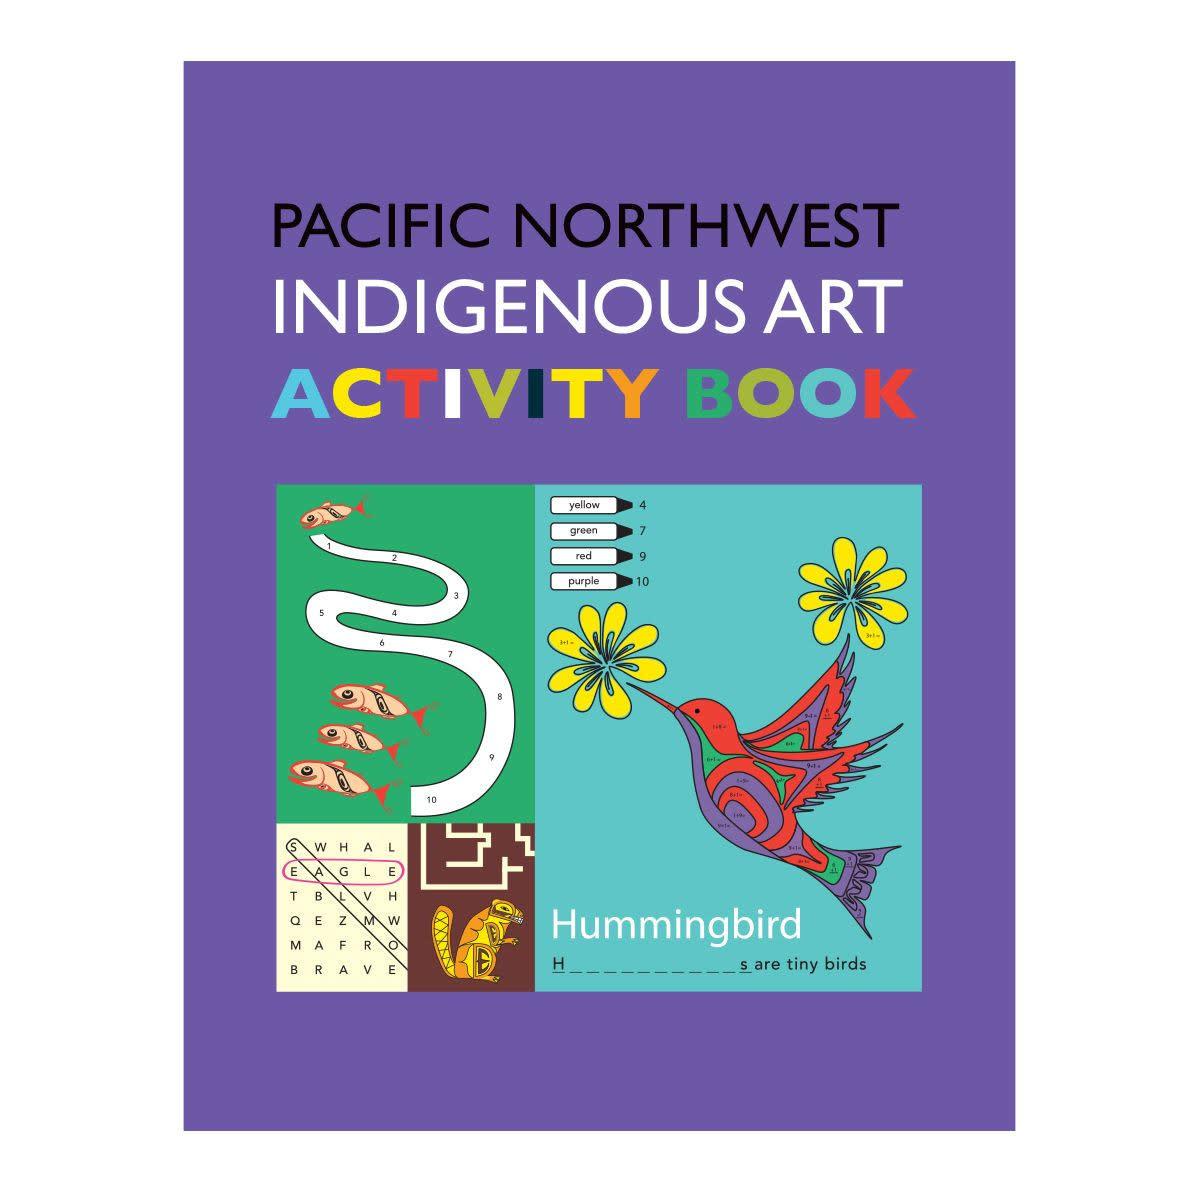 Pacific Northwest Indigenous Art Book- Activity Book-1